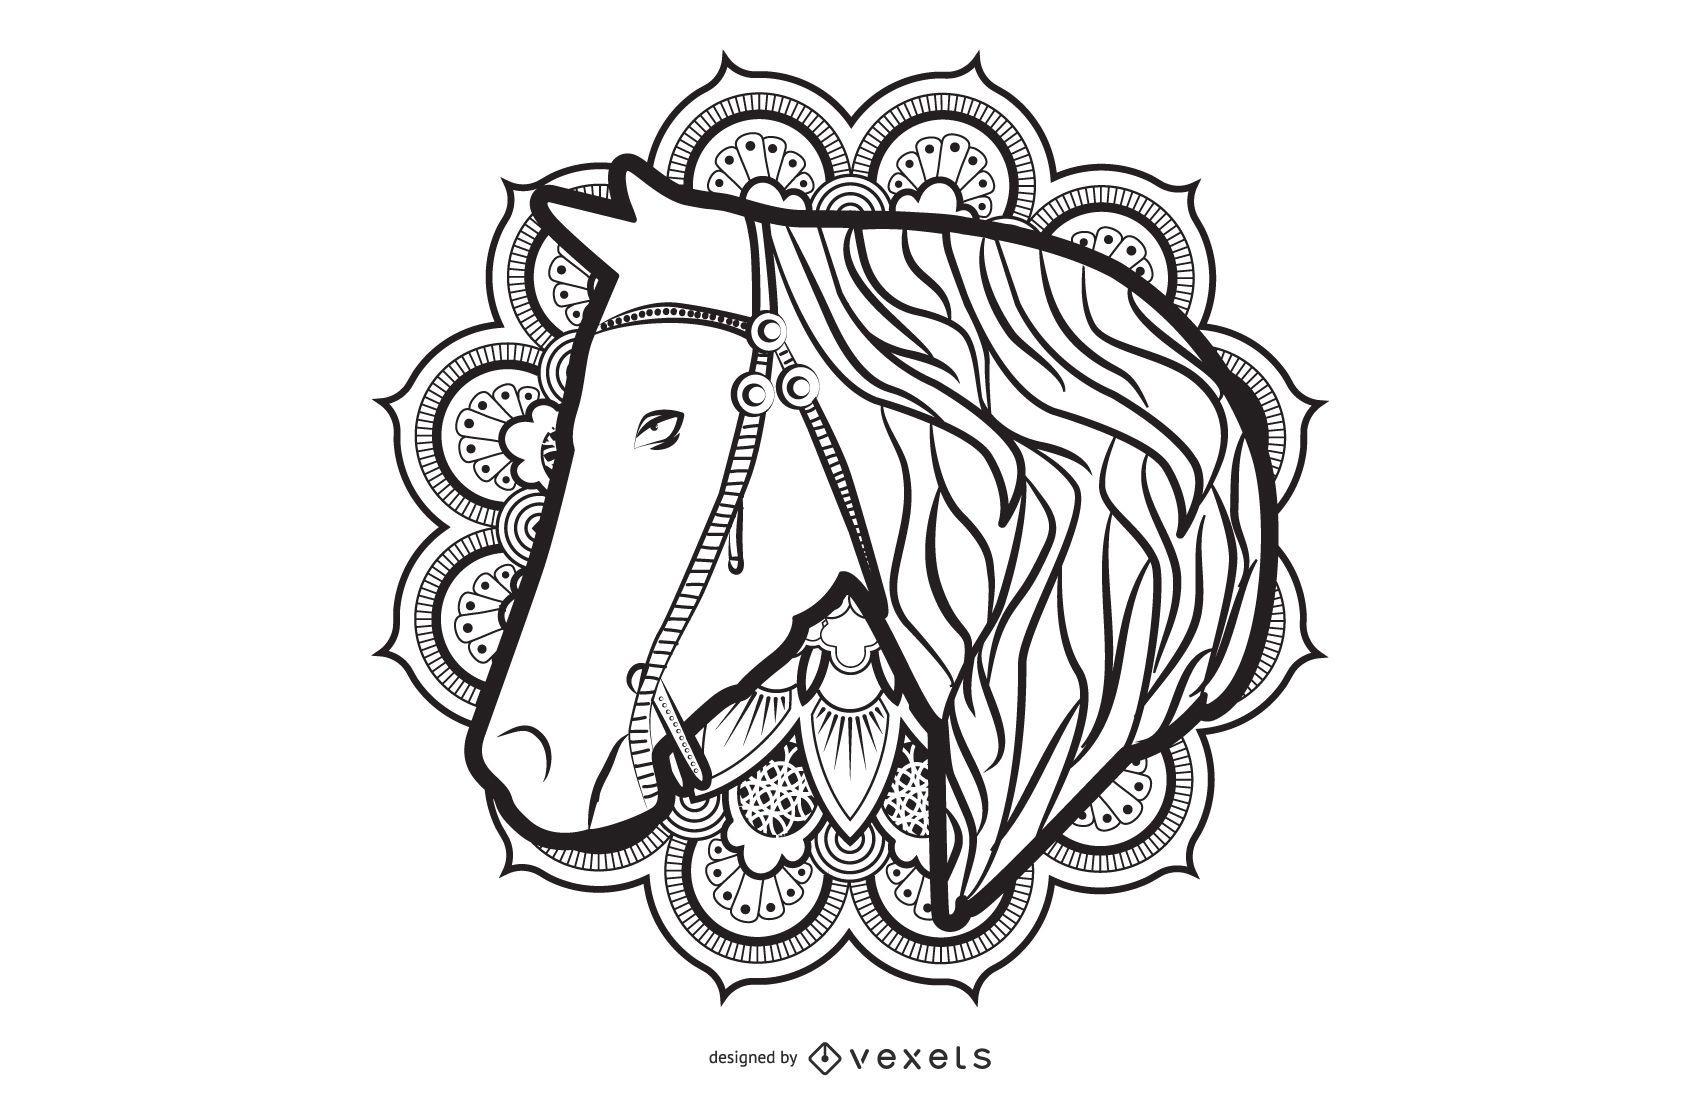 Diseño de caballo mandala